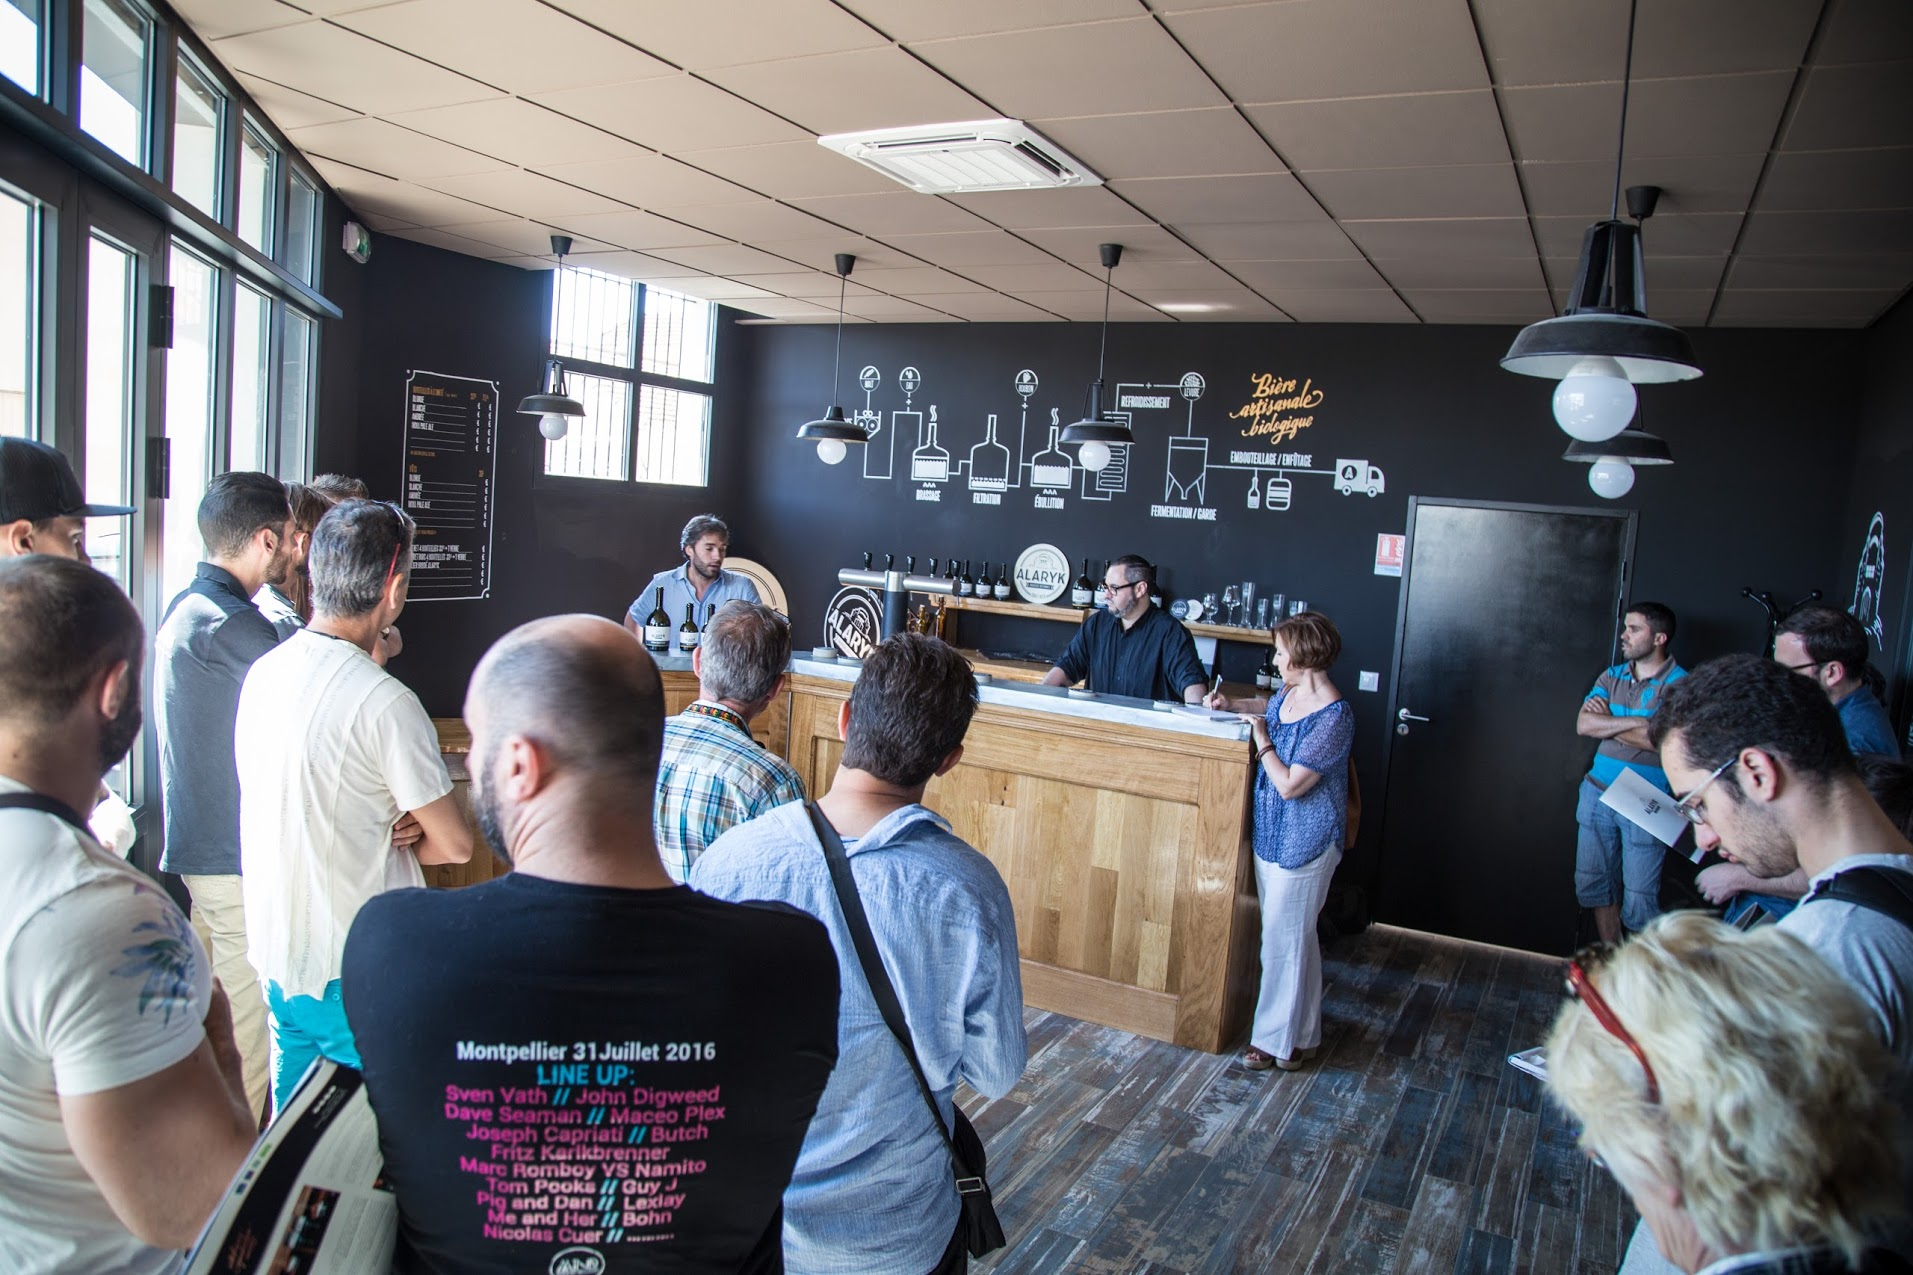 Visite et dégustation à la brasserie artisanale Alaryk